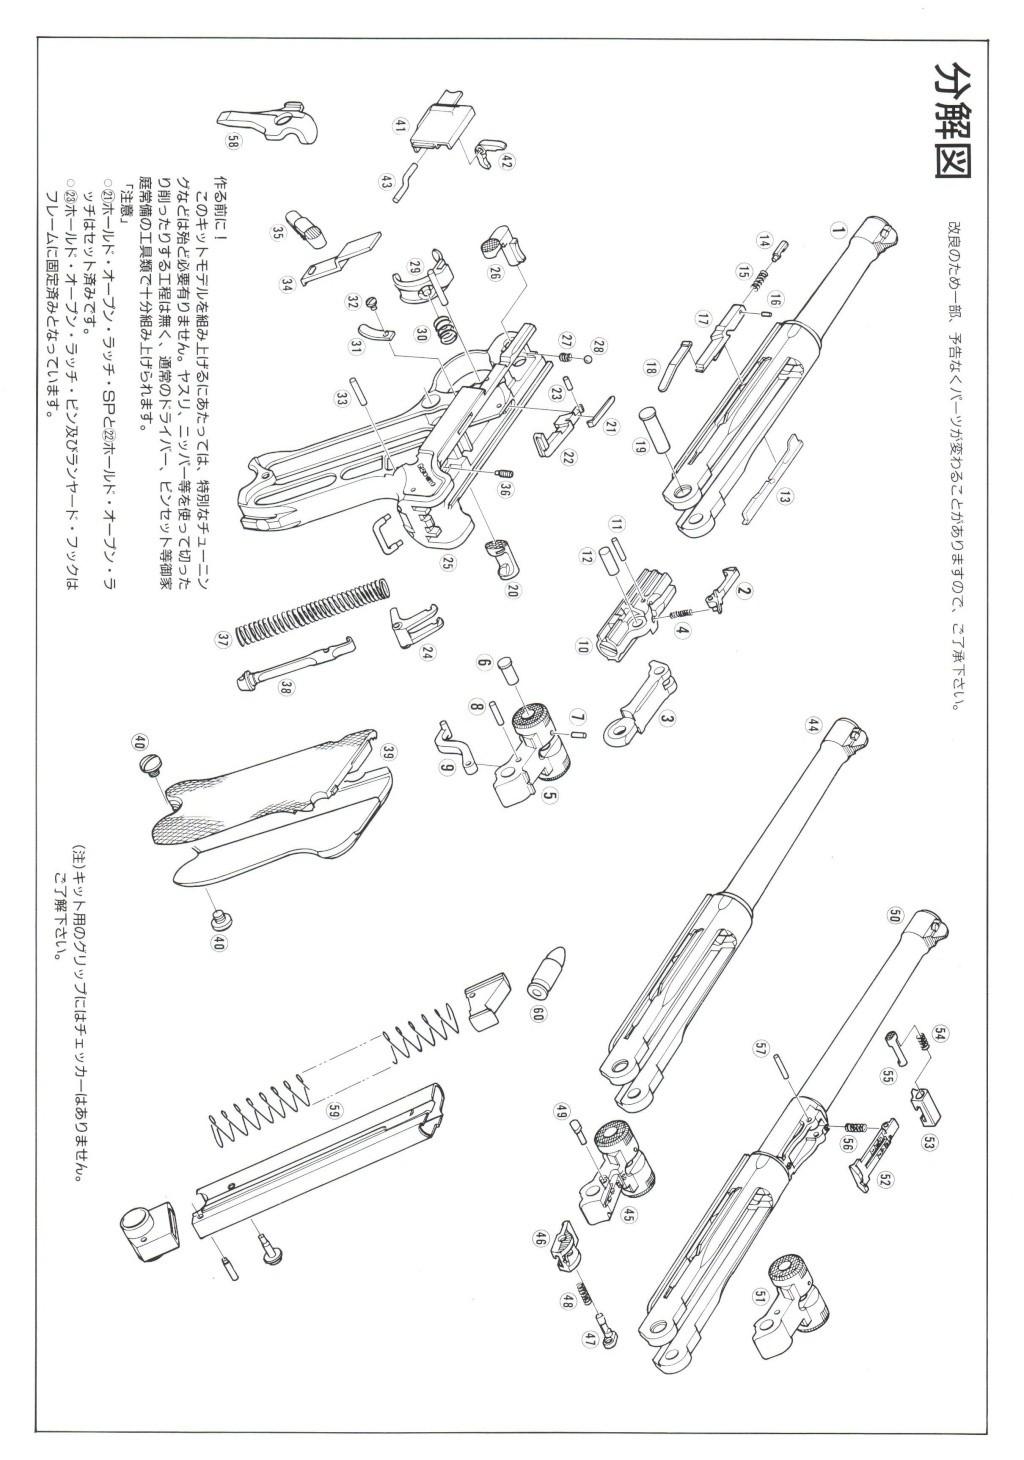 Marushin Metal KIT Dummy Cartridge Model LUGER P08 cal. 9 mm Instruction Manual G10